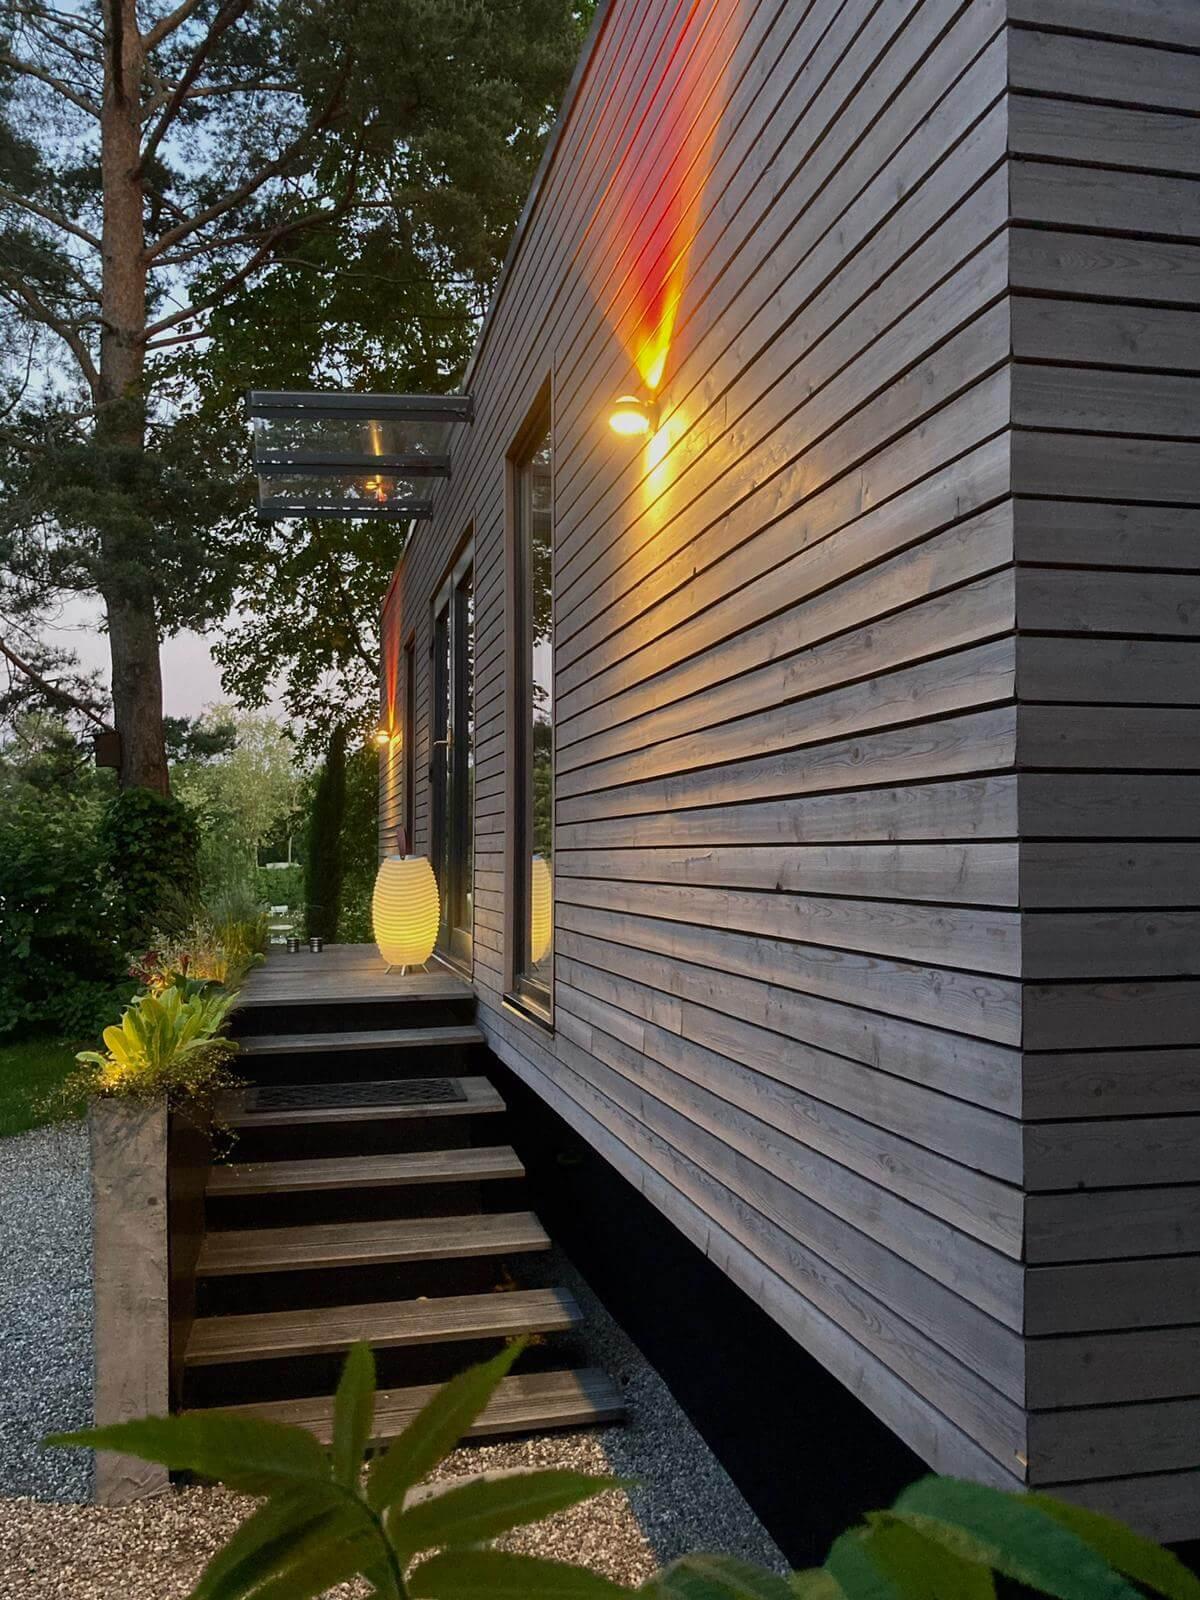 mobiles-chalet-norwegen-mobiles-tiny-house-21